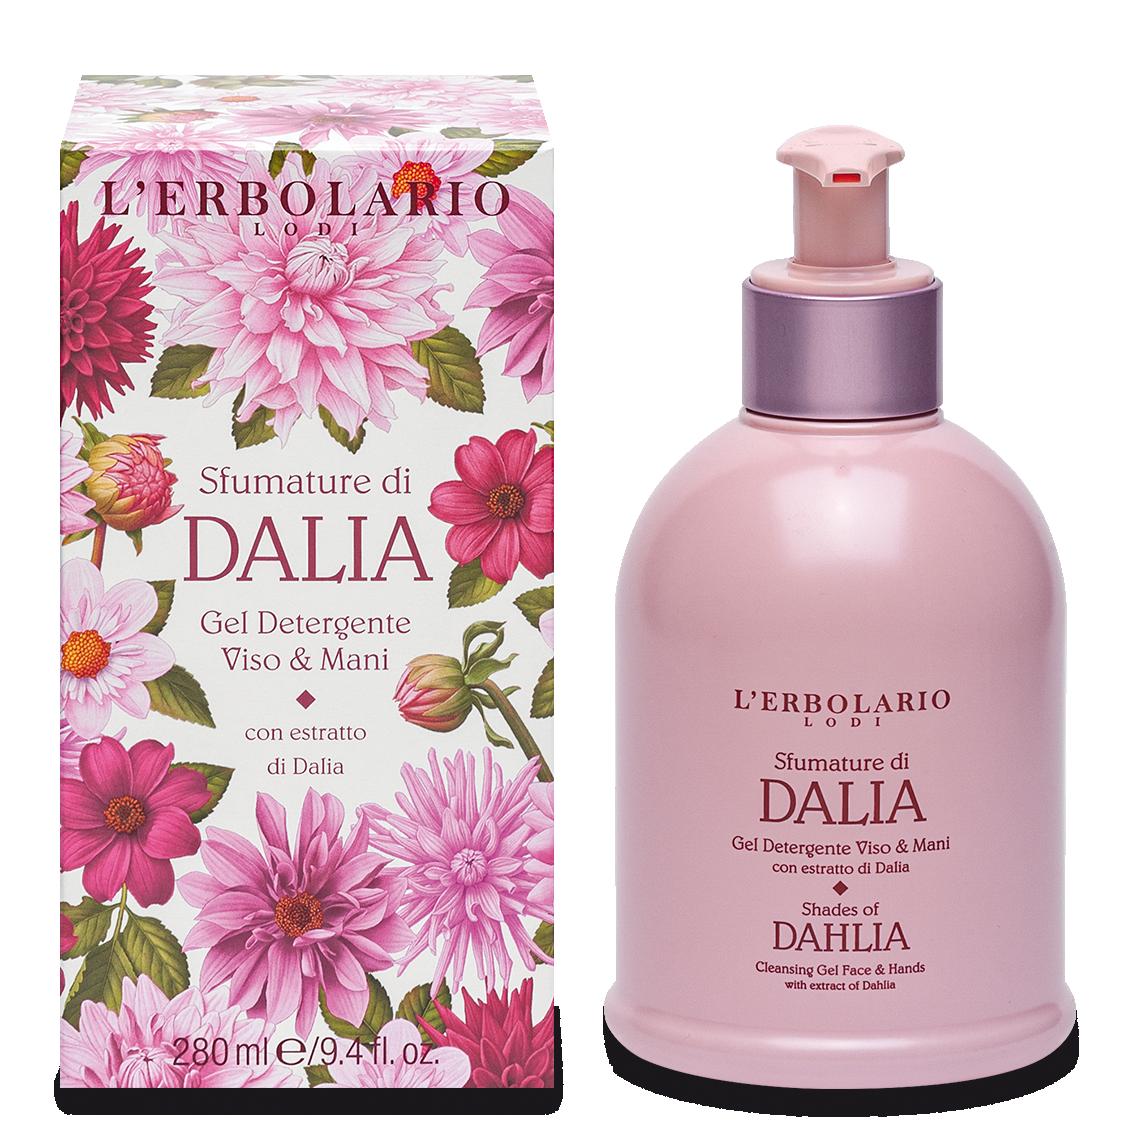 Gel detergente viso & mani Sfumature di Dalia